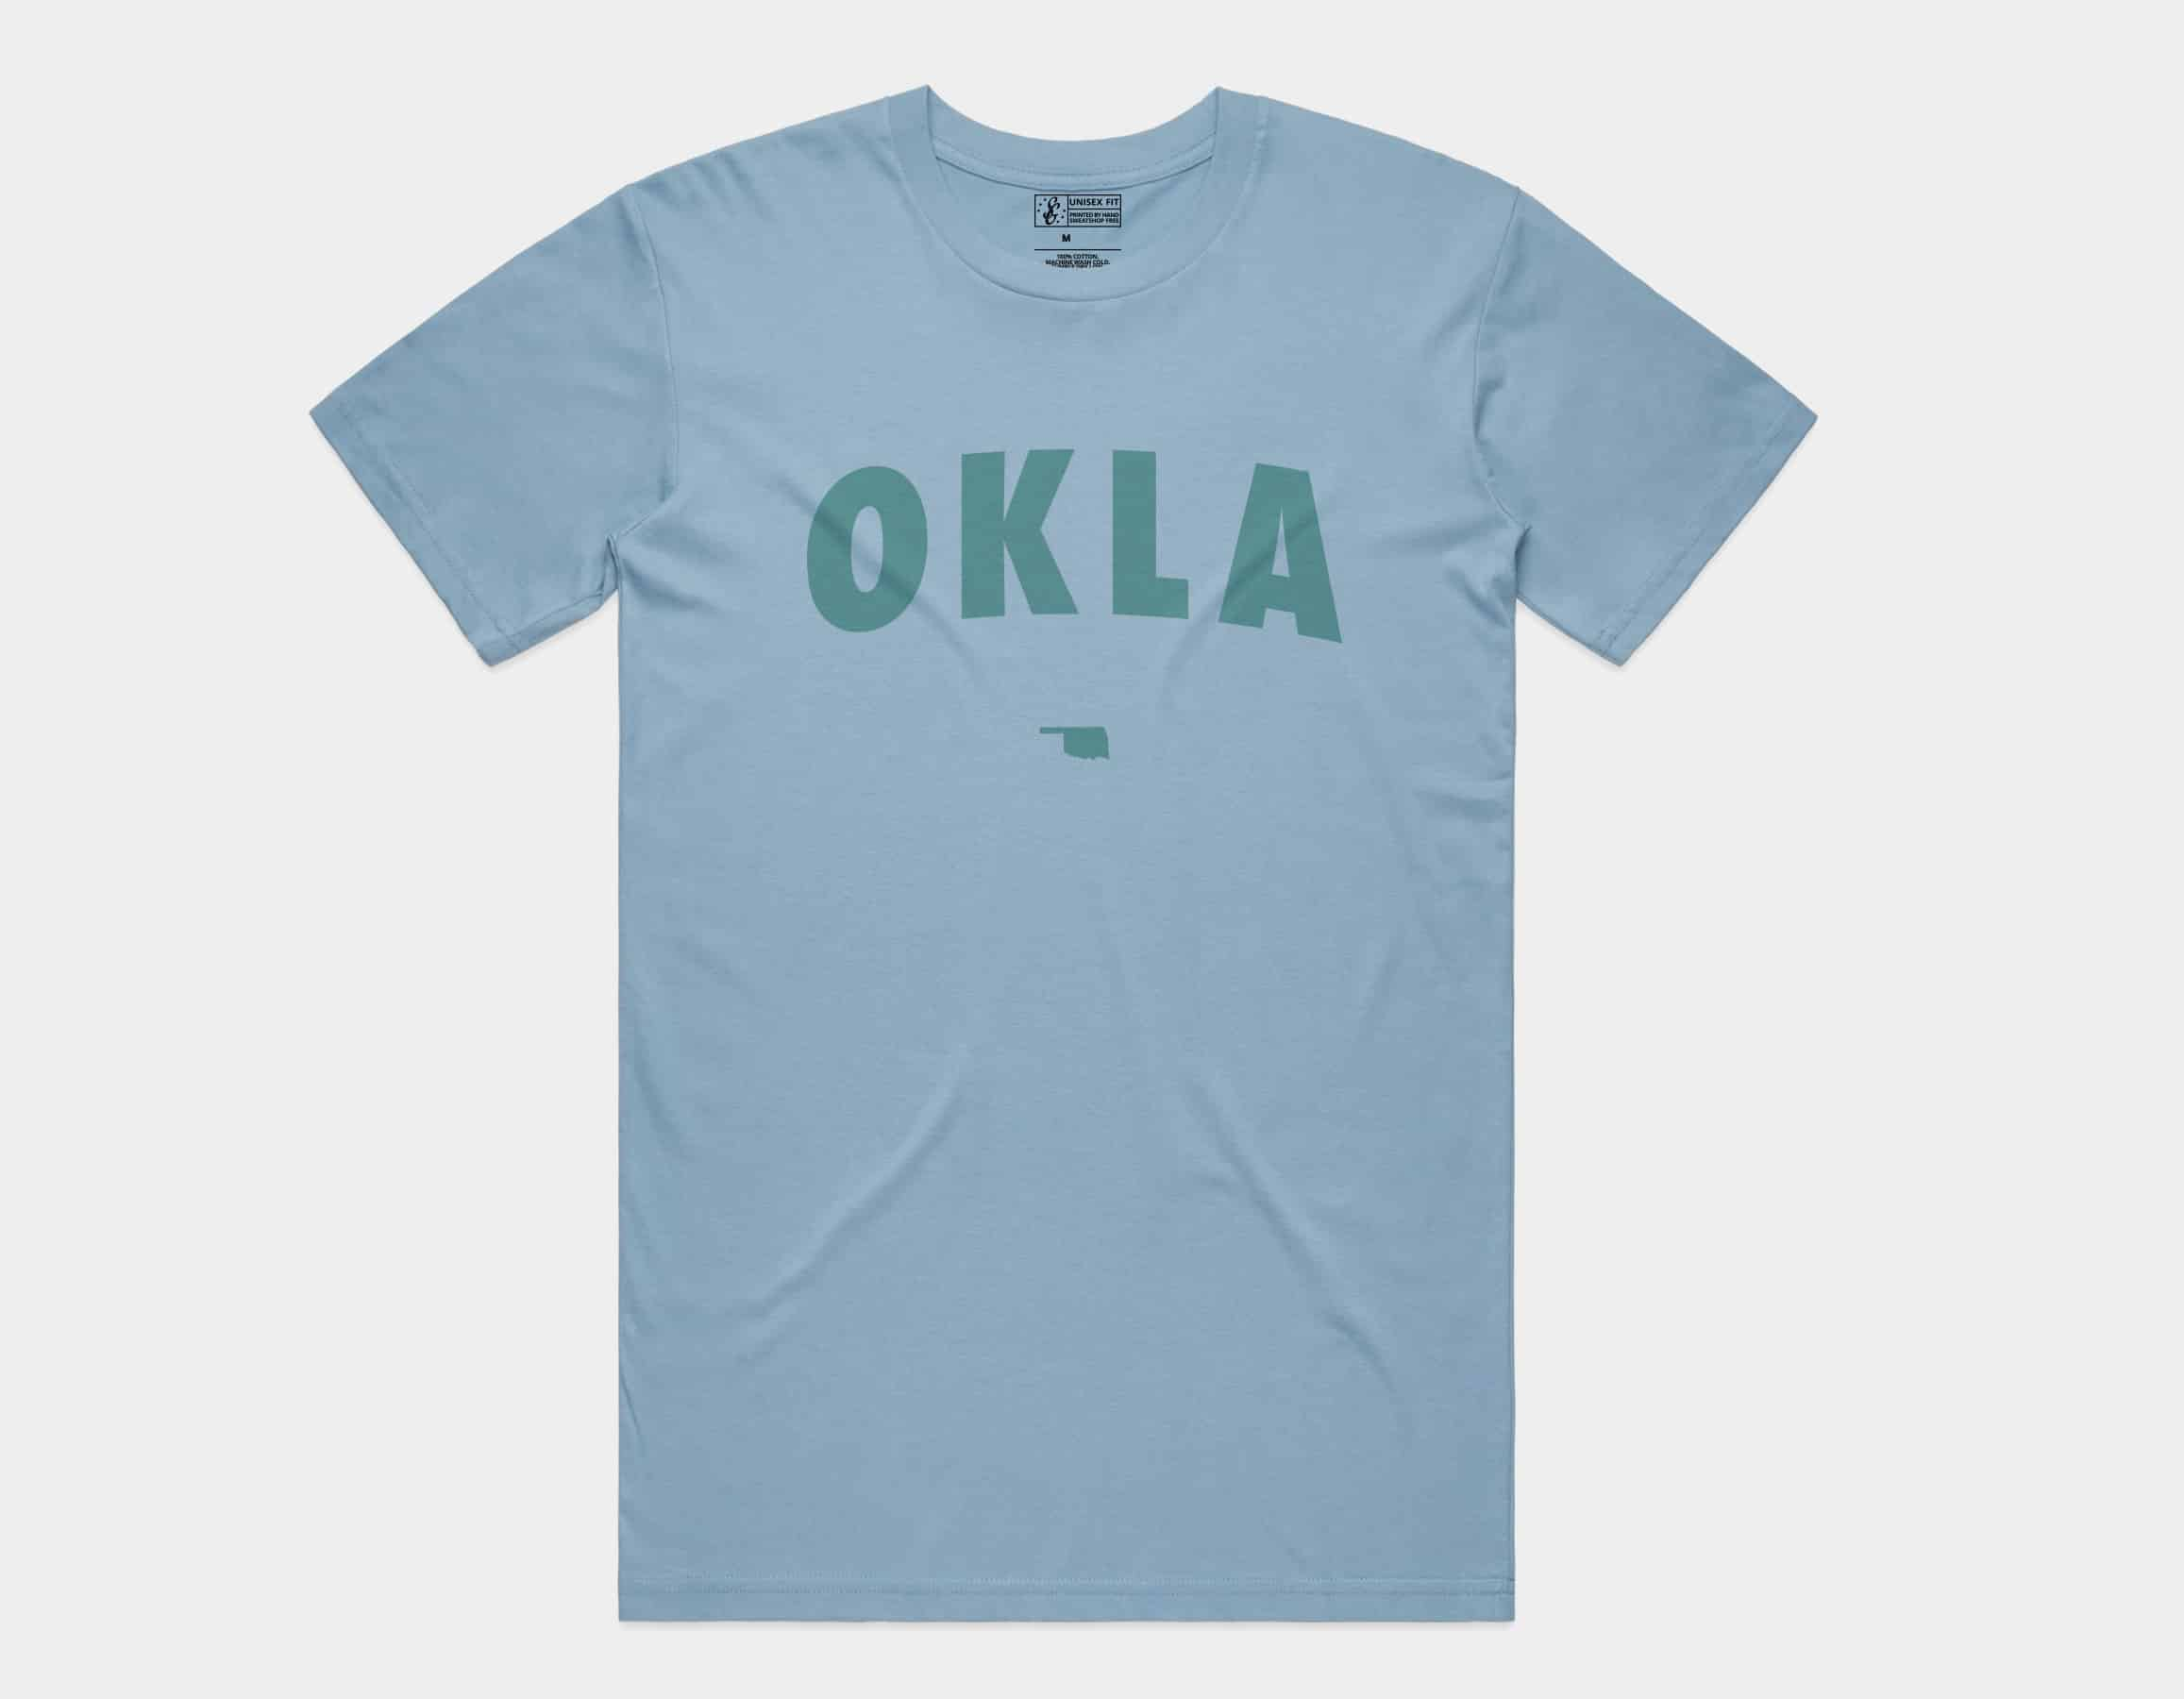 OKLA Tee Sky Blue